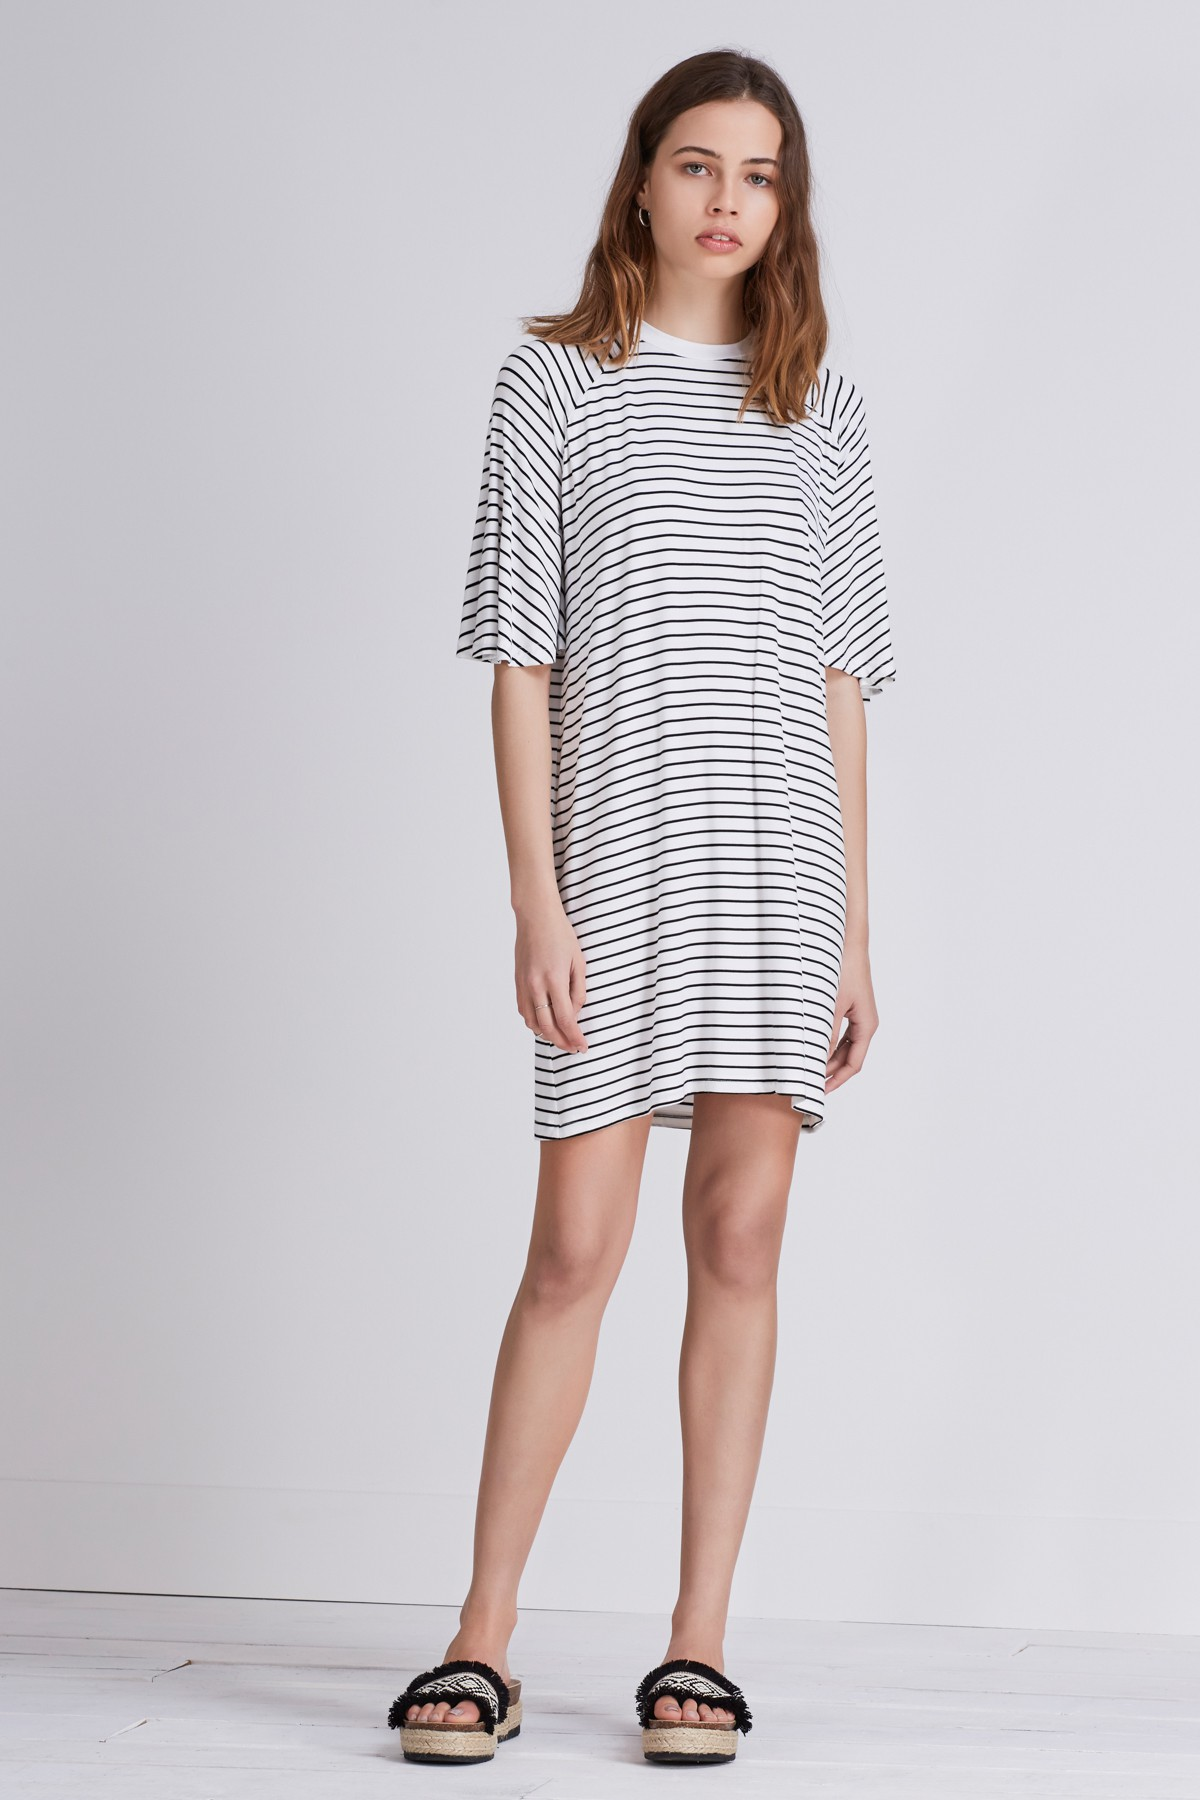 The Fifth Label Hamilton Dress.